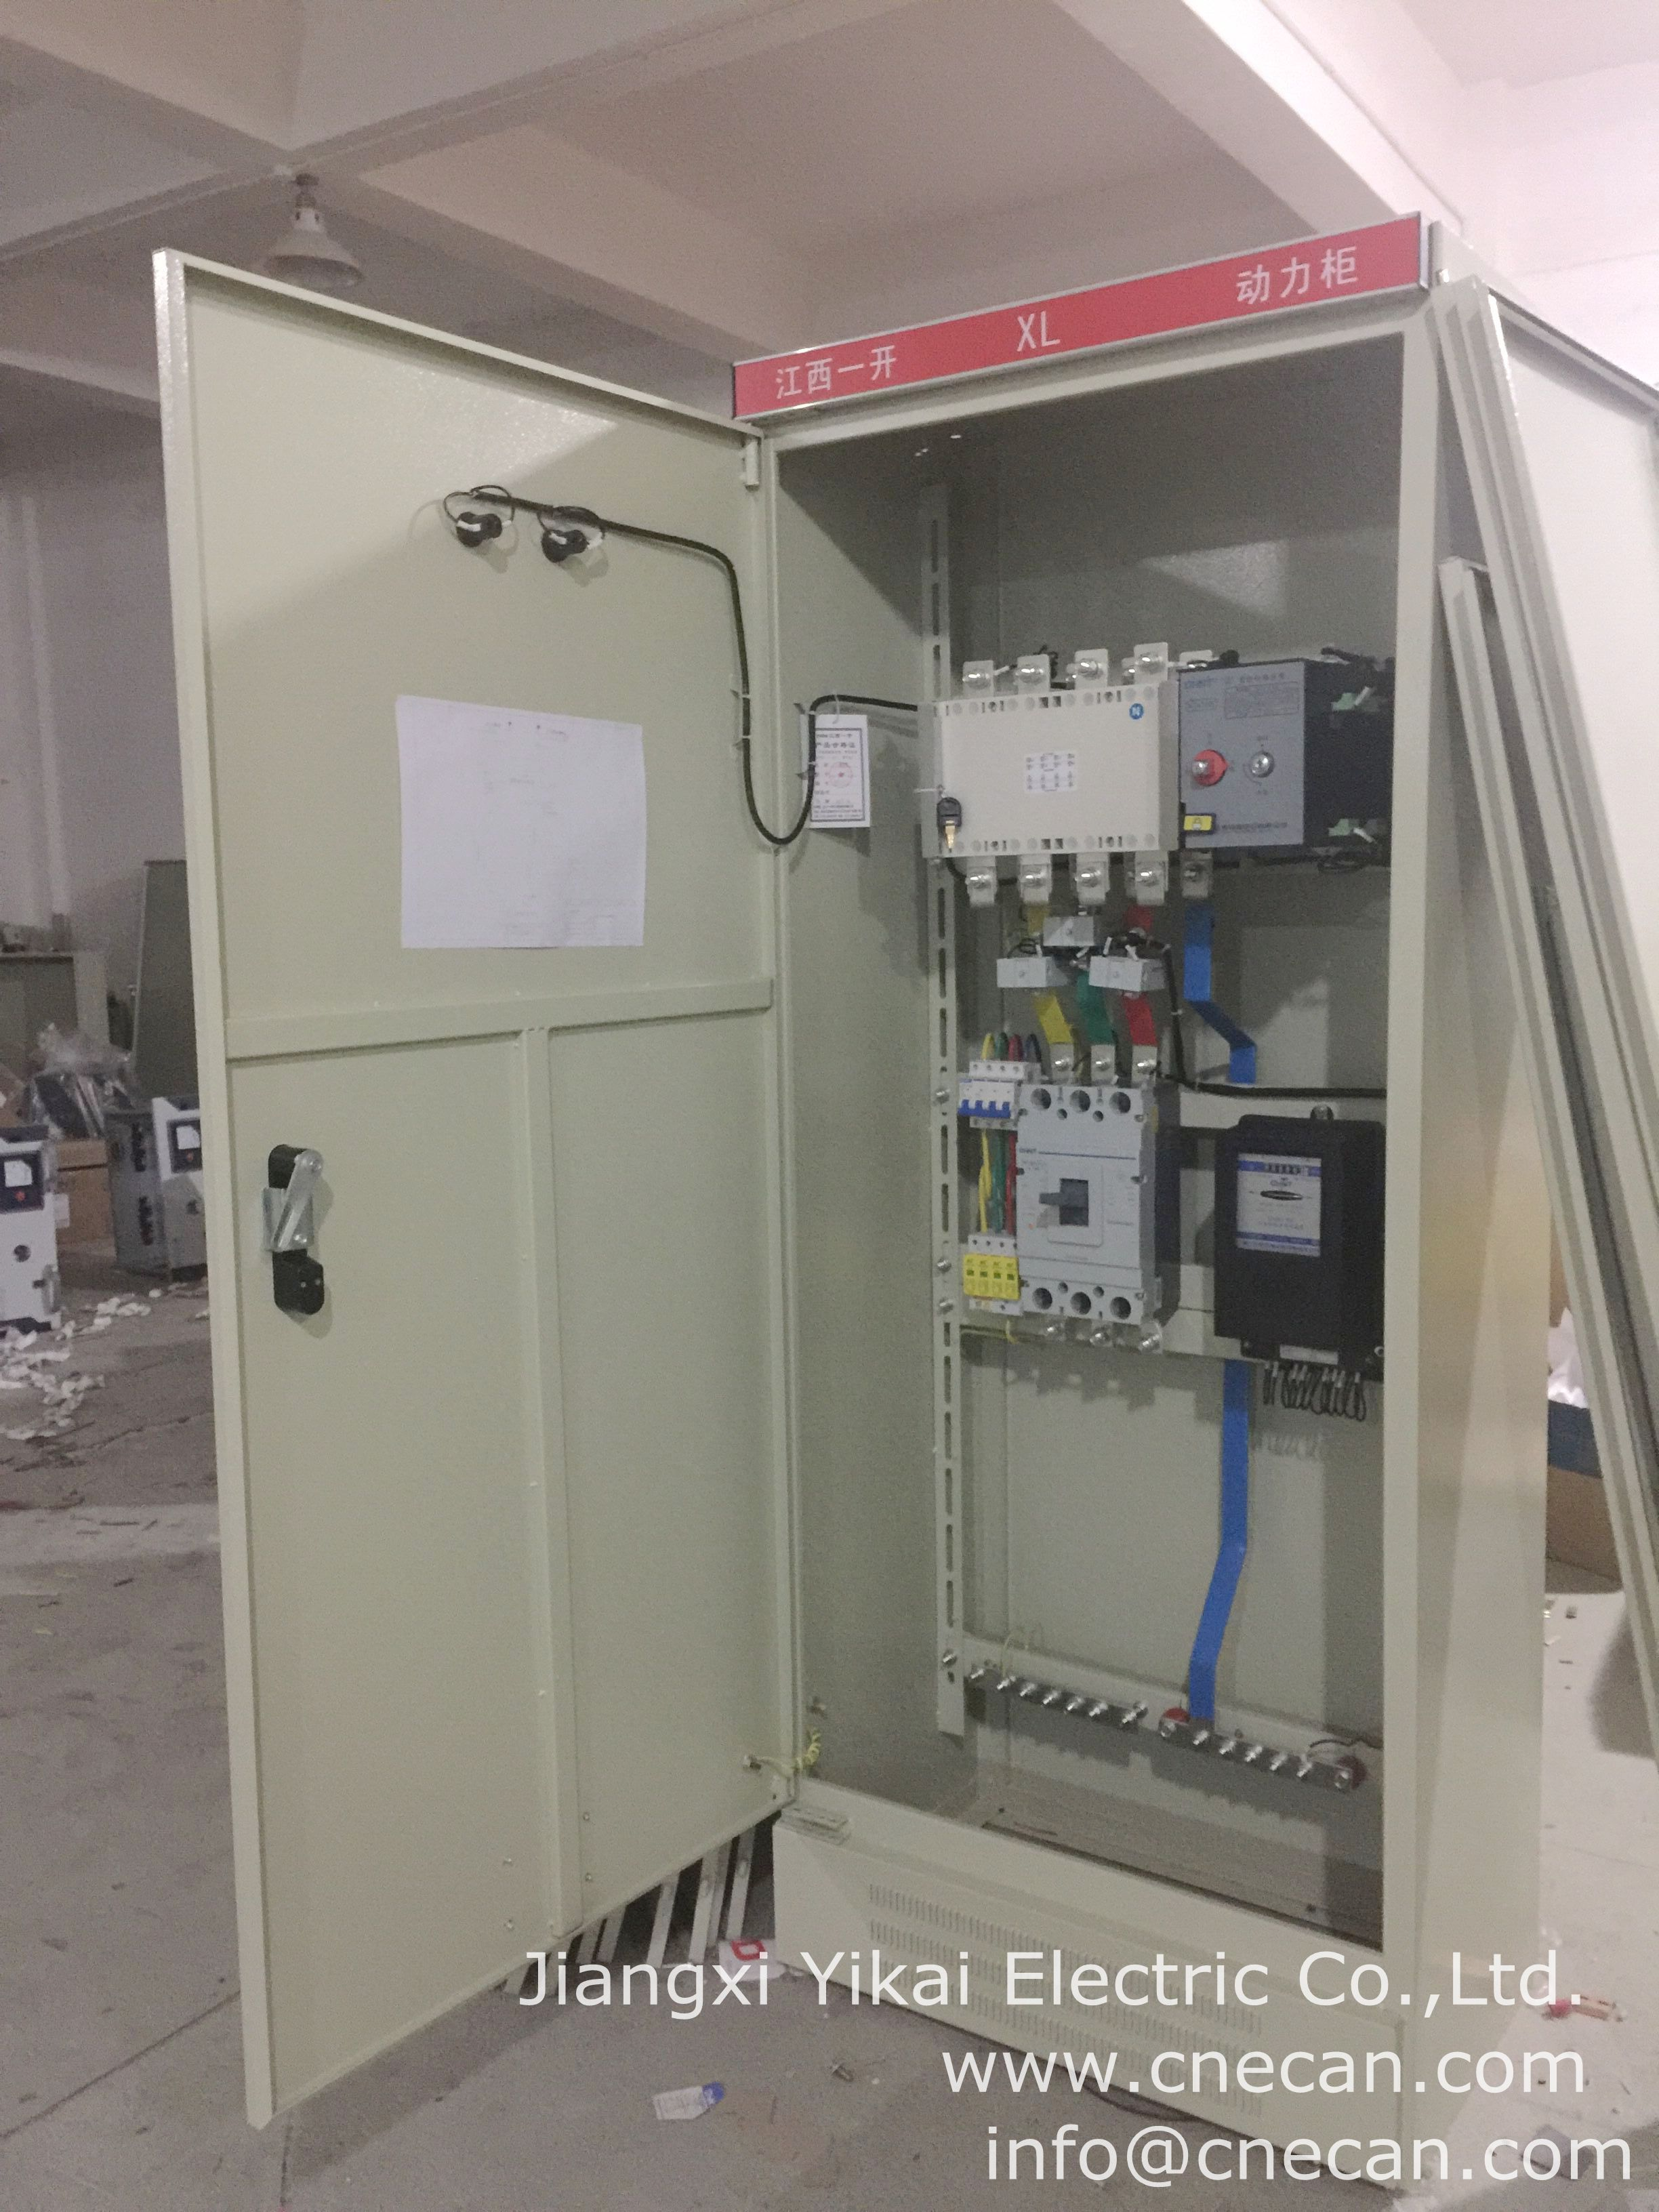 Pin By Blesia Zhao On Low Voltage Switchgear Locker Storage Storage Manufacturing